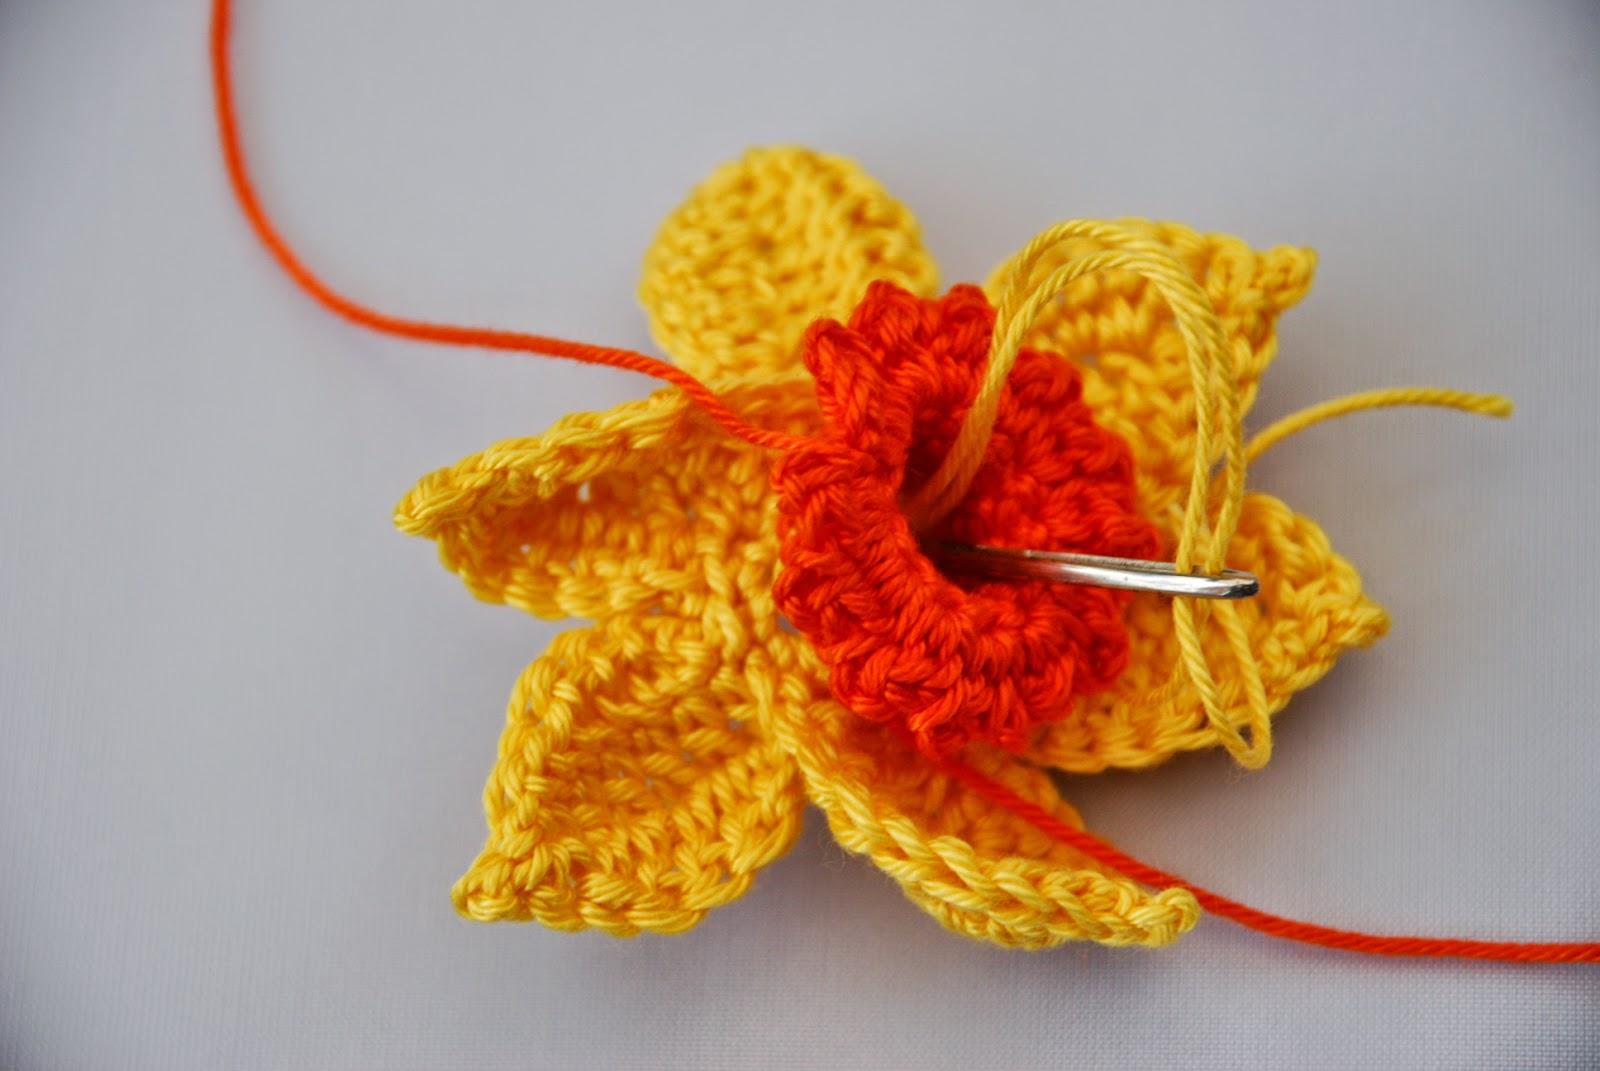 Crochet Daffodil pattern and tutorial: image of making daffodil stamens